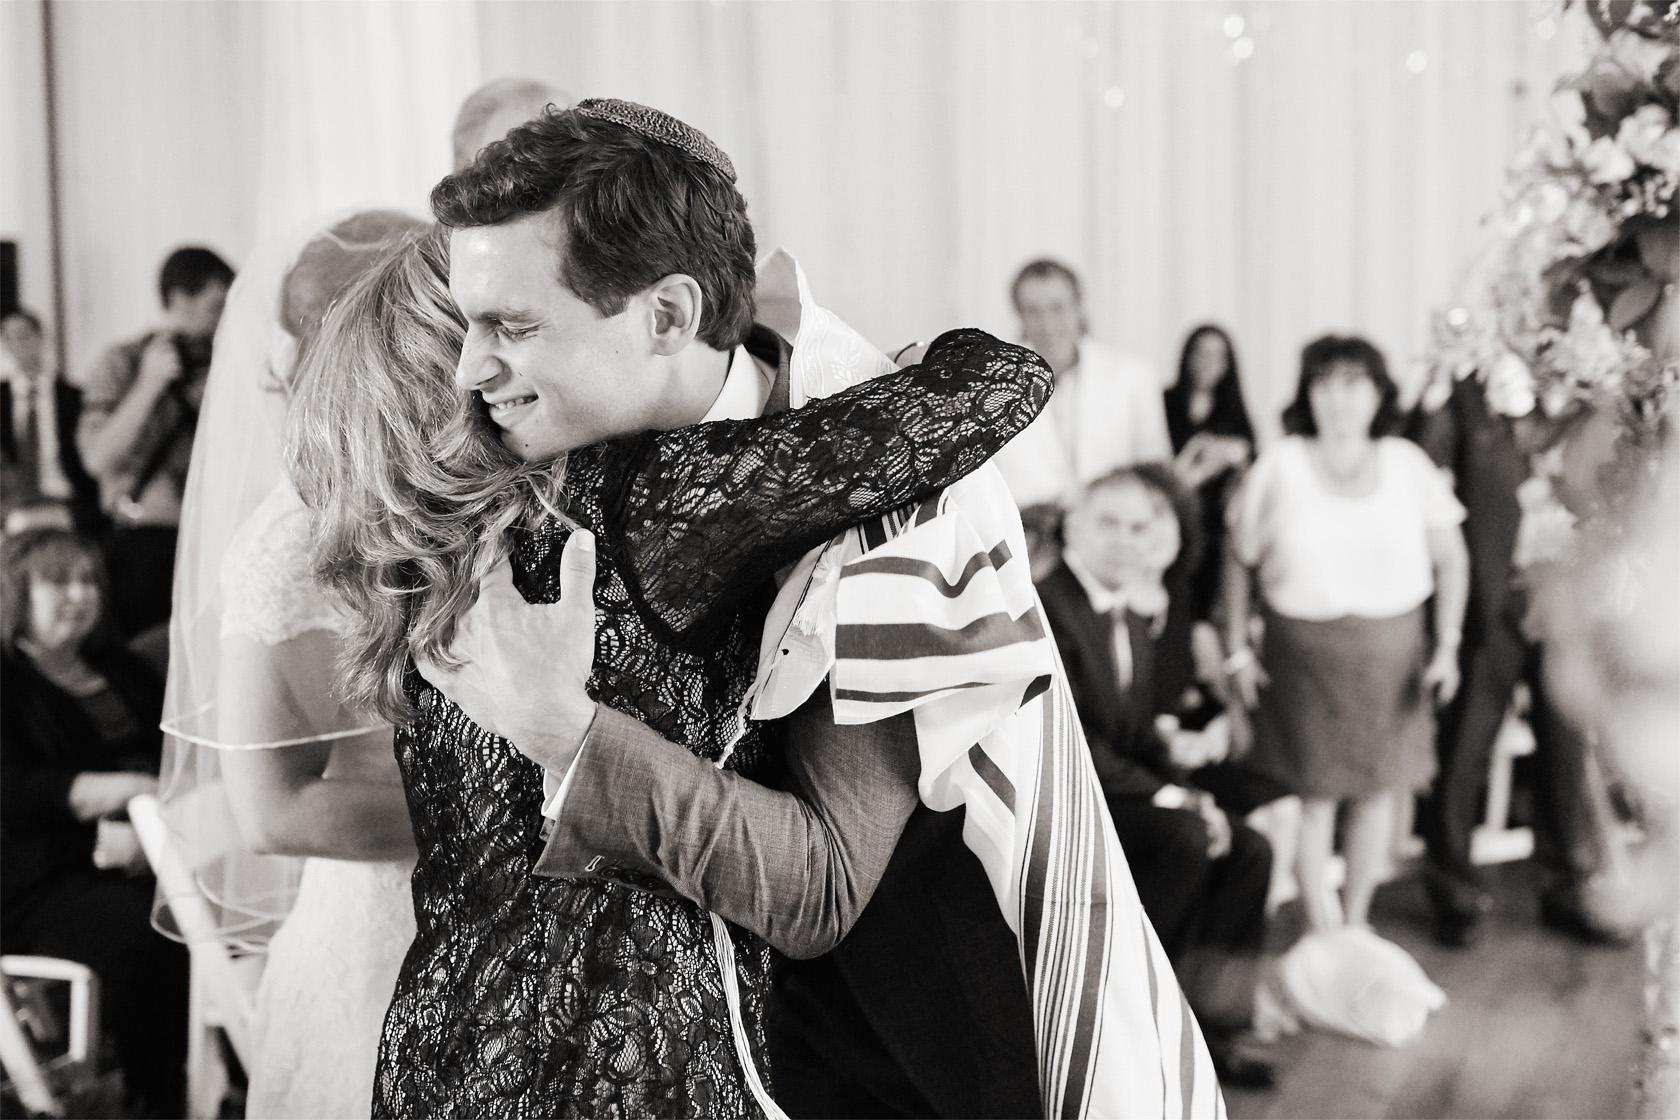 steve-sager-0057_gladstone hotel wedding